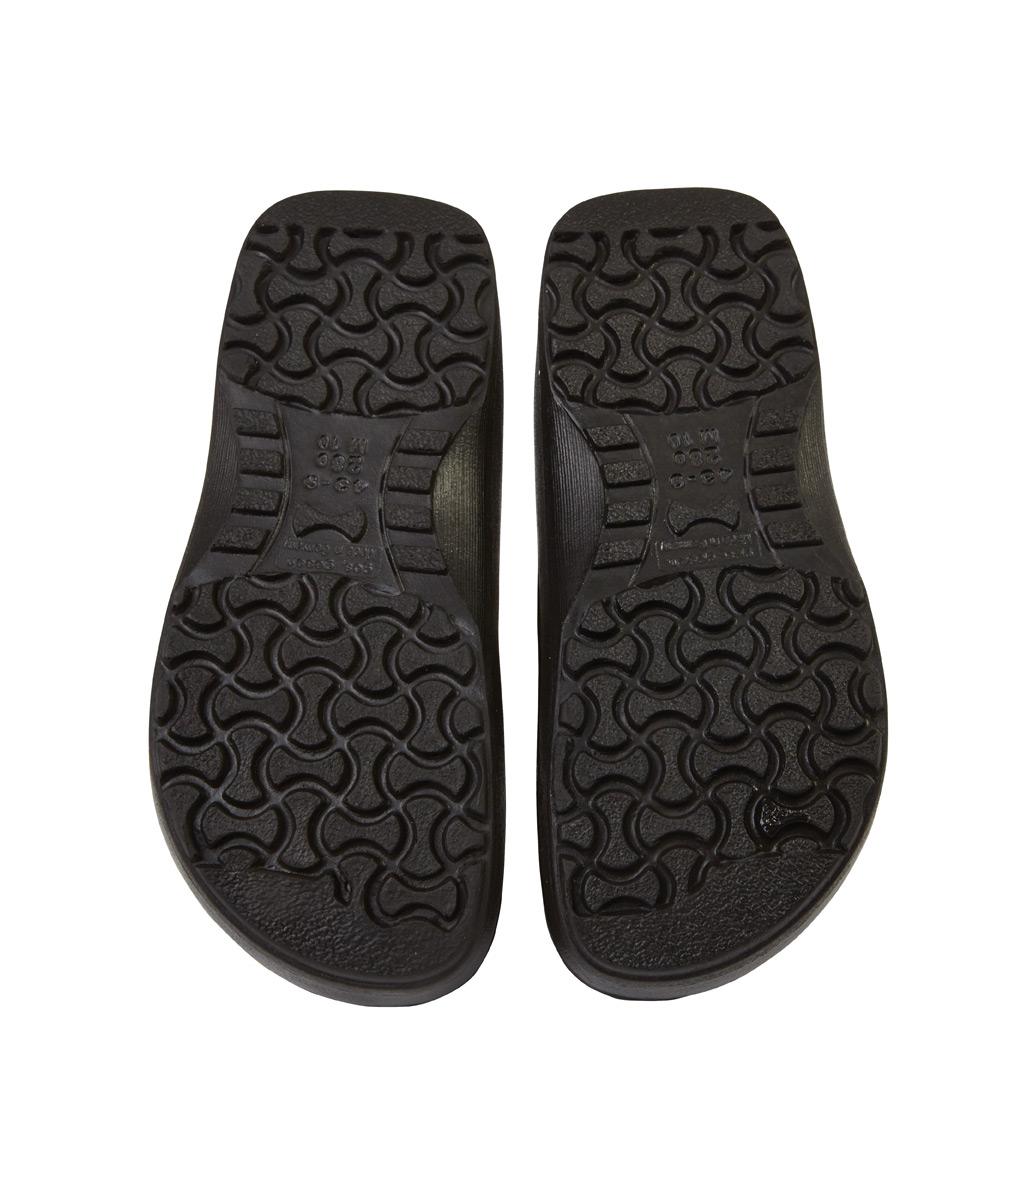 8ea7758e5cc9 Chef Shoes